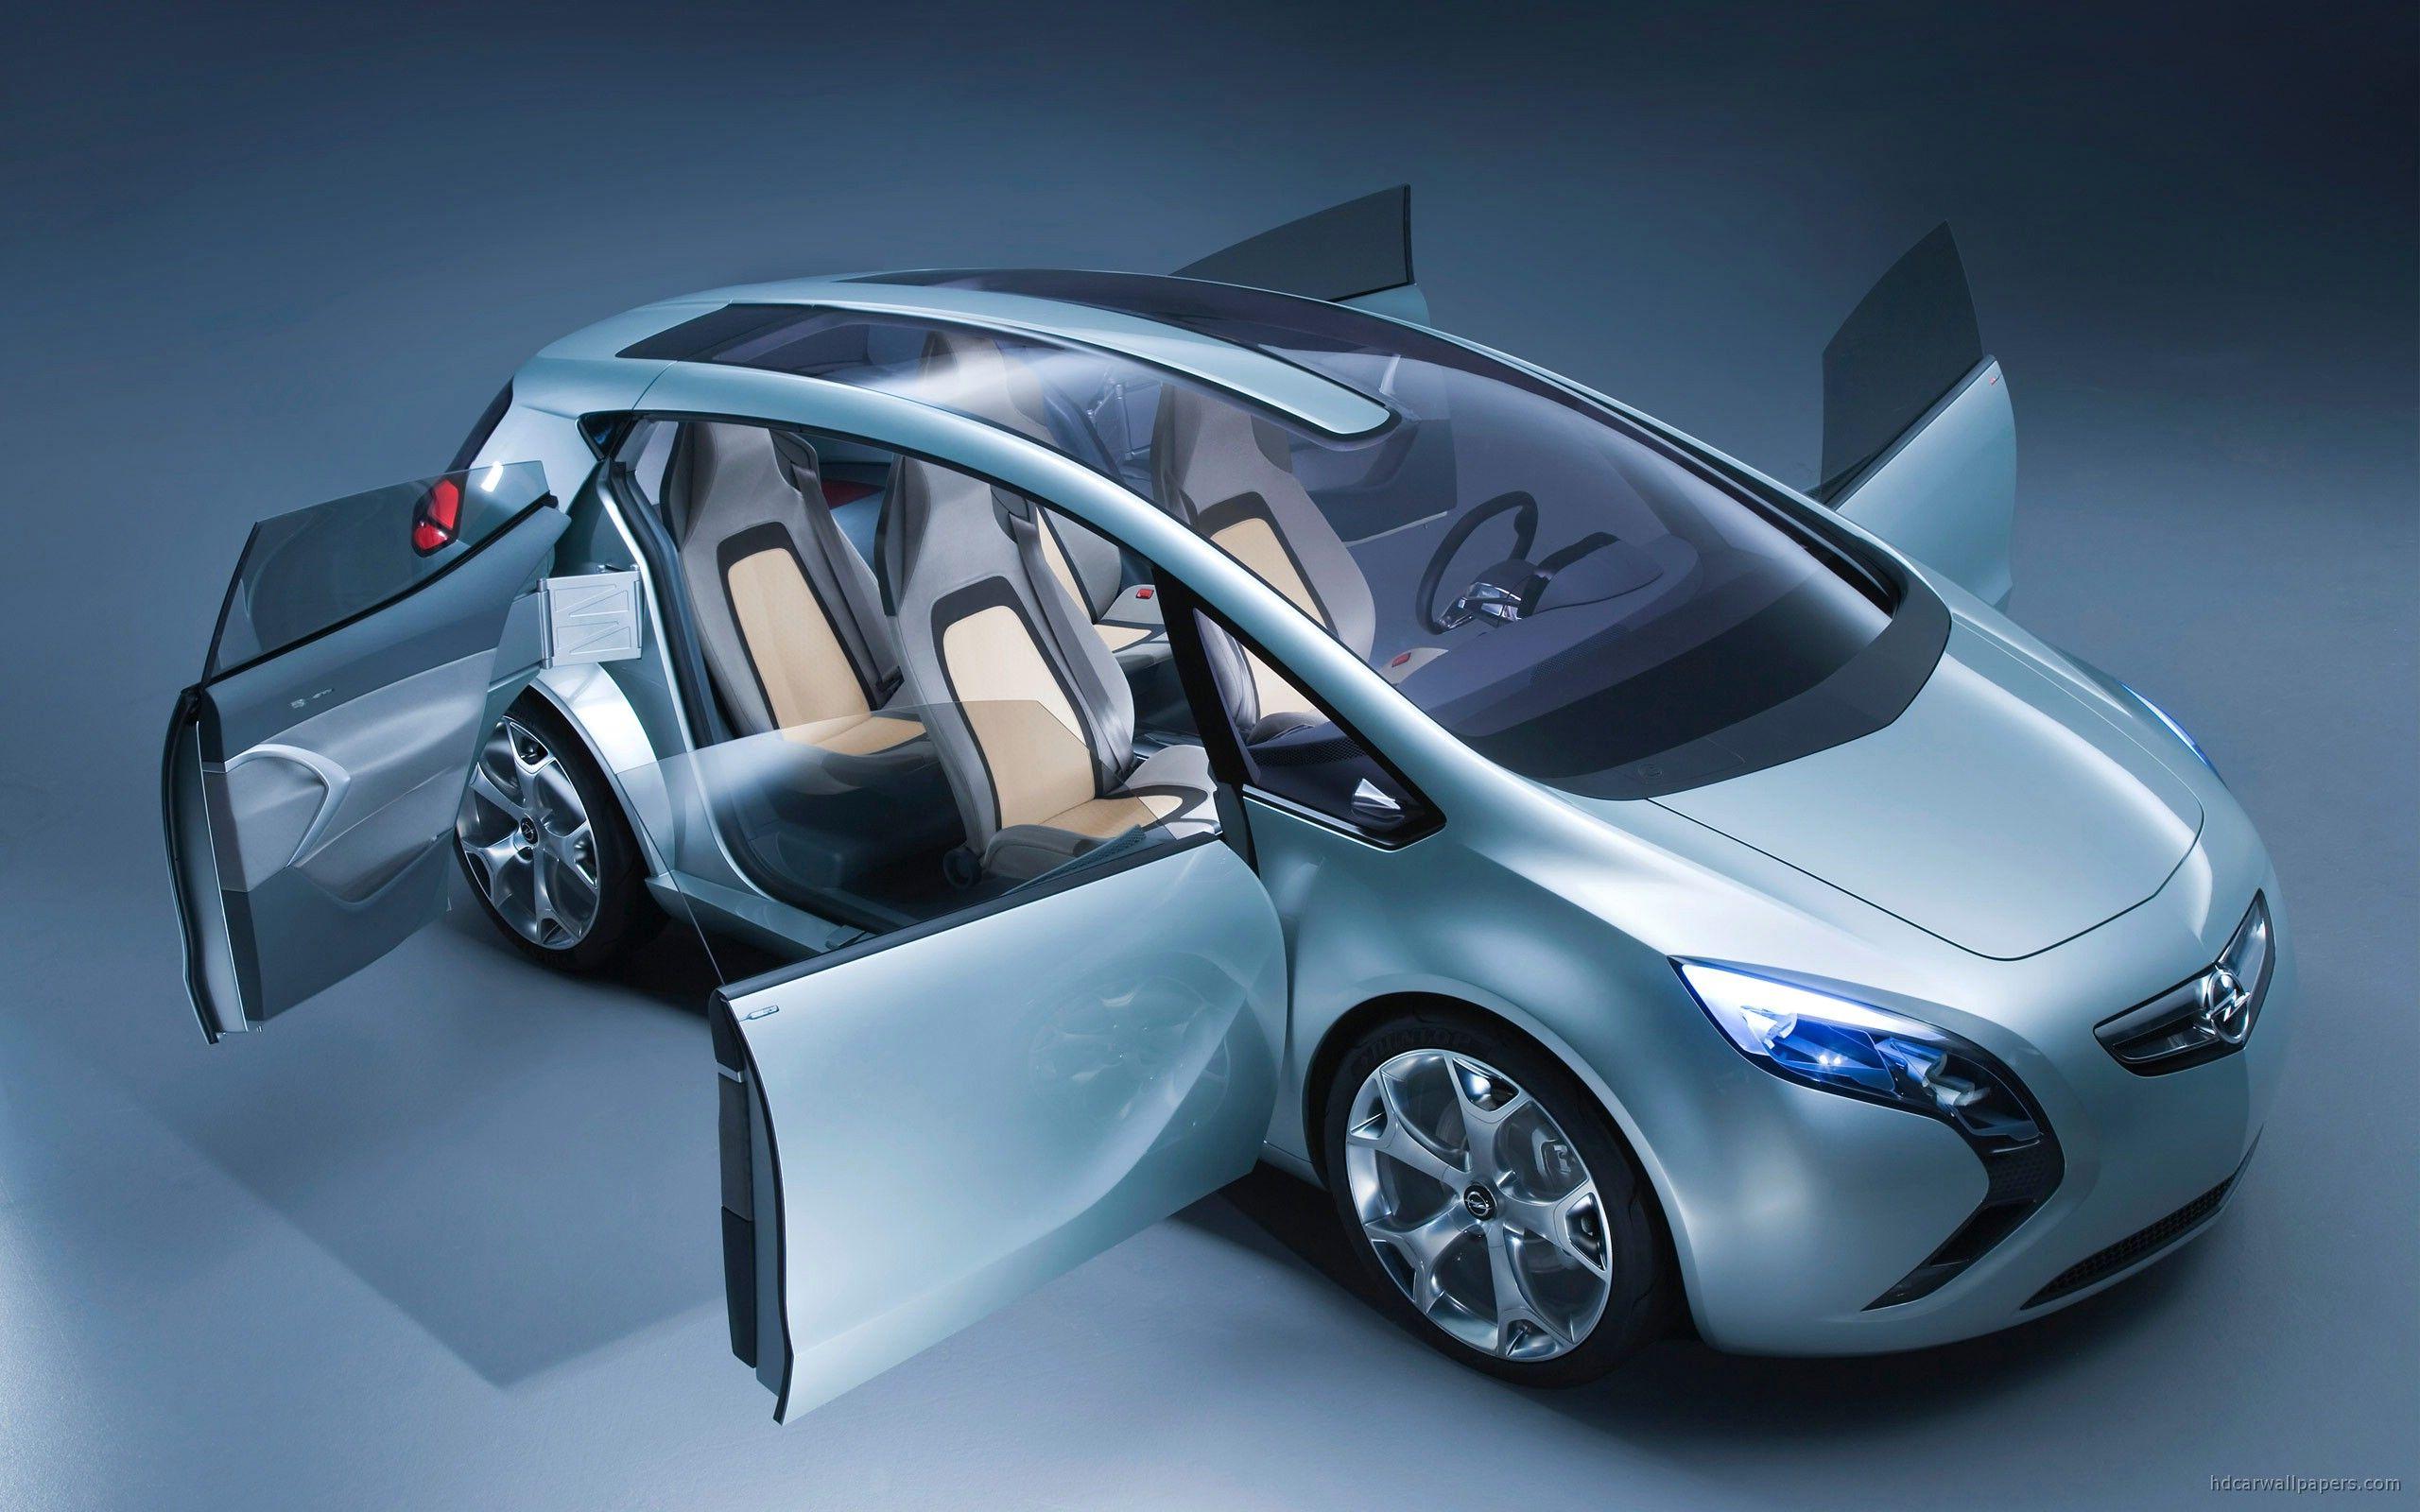 Vauxhall flextreme modern car wallpaper http69hdwallpapers car images voltagebd Images